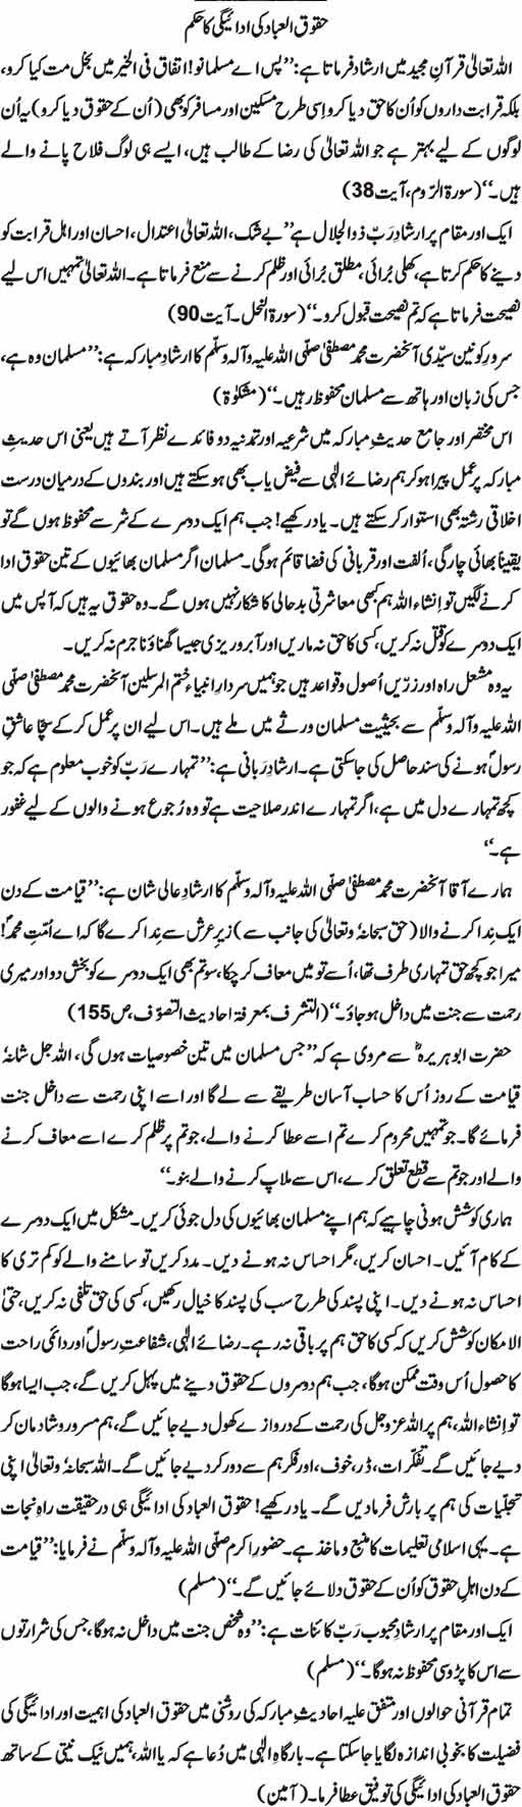 001 Harkat Mein Barkat Essay In Urdu Example Haququl Amazing On Topic Hai Short Full